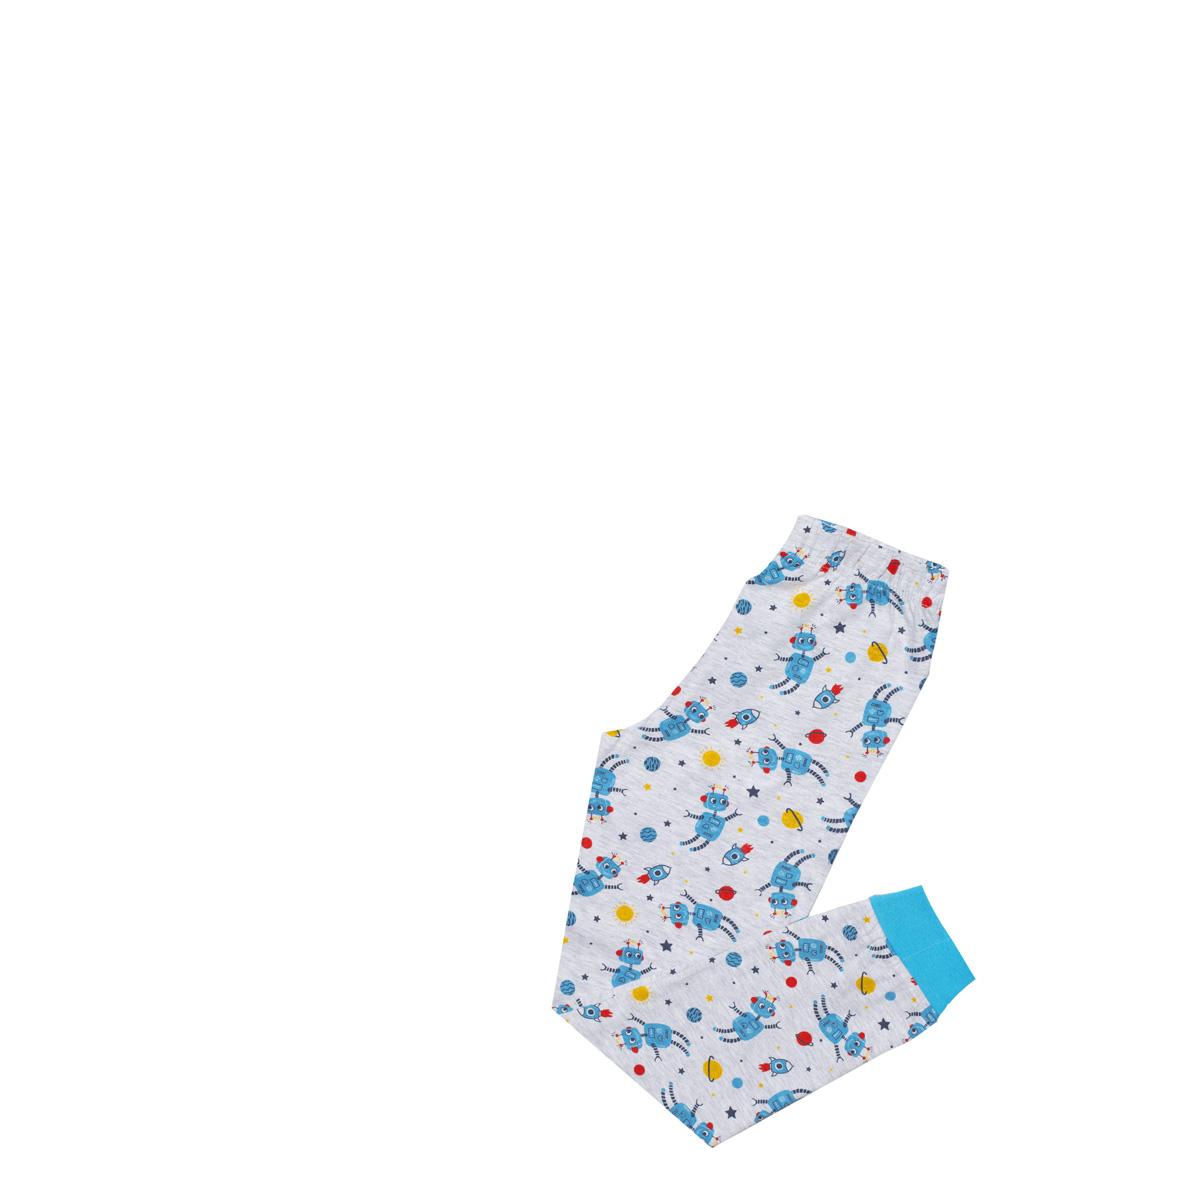 Fantovska pižama, melange siva